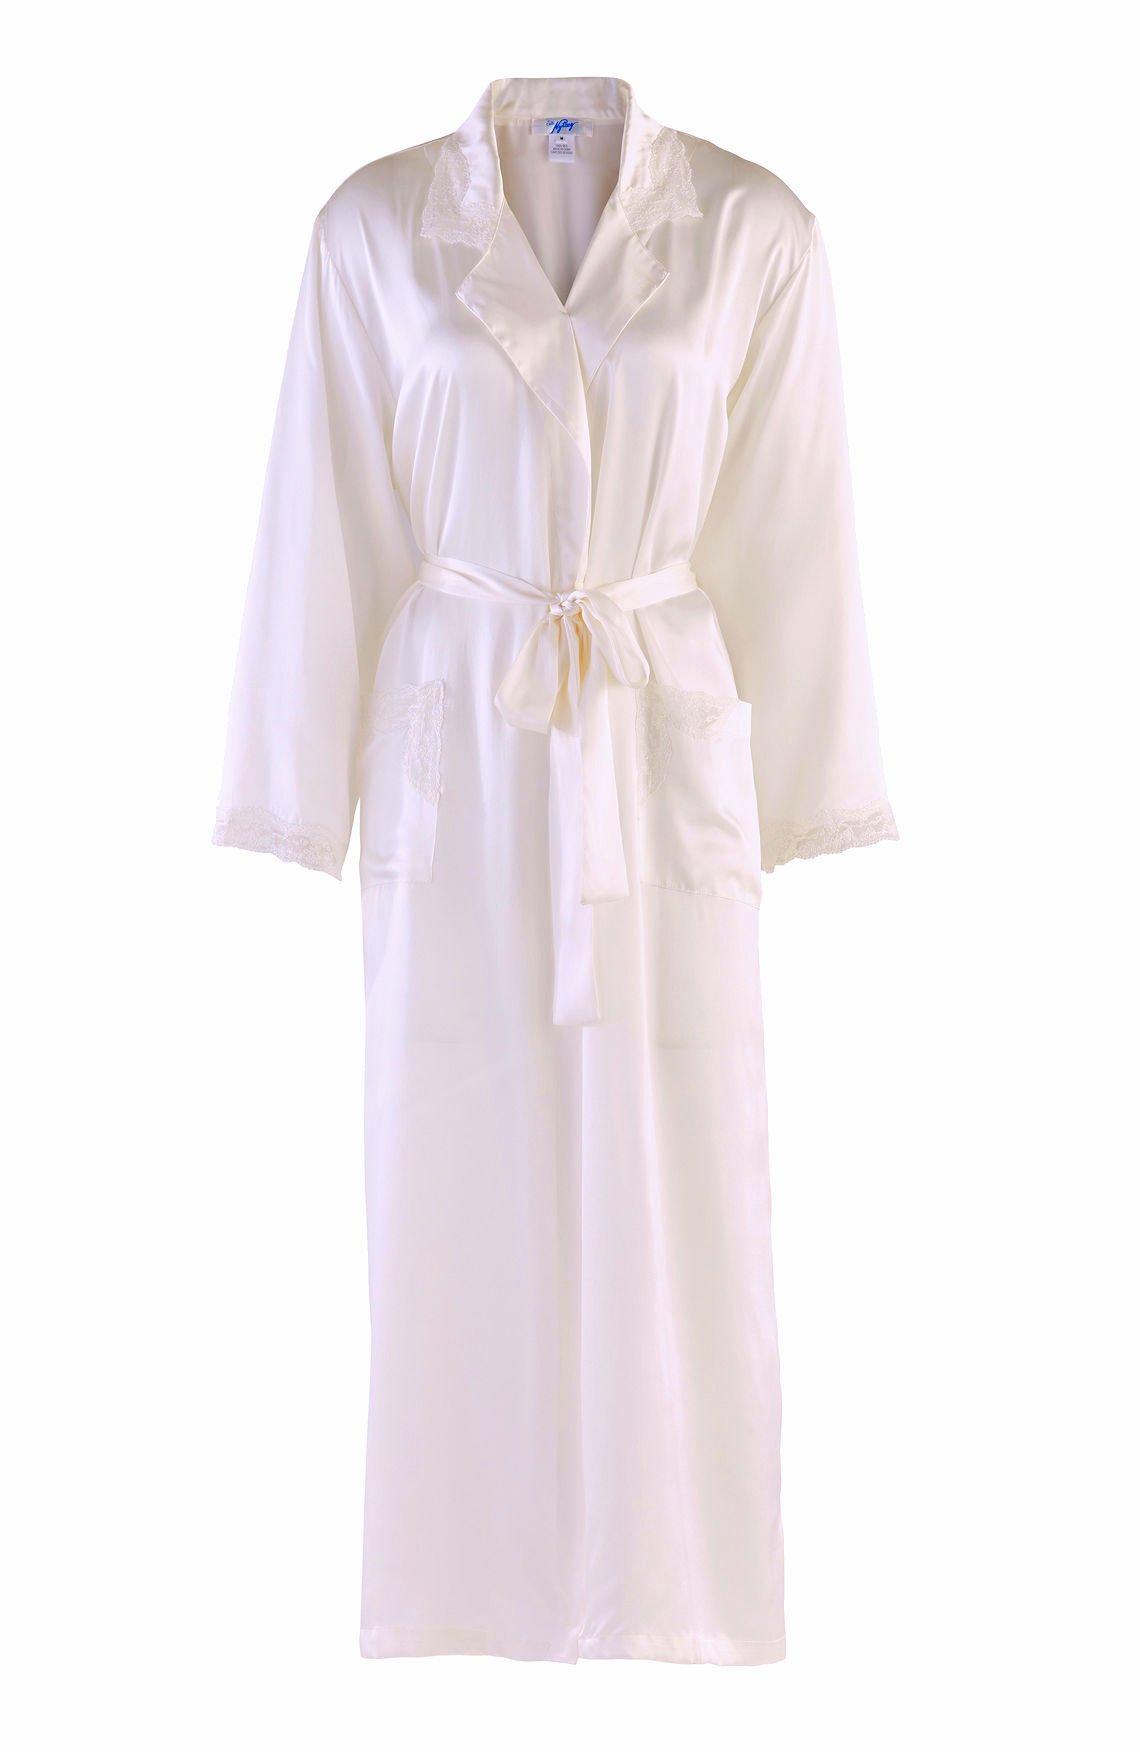 Nyteez Women's Natural Silk Long Bathrobe Dressing Gown (Small, Creamy White)